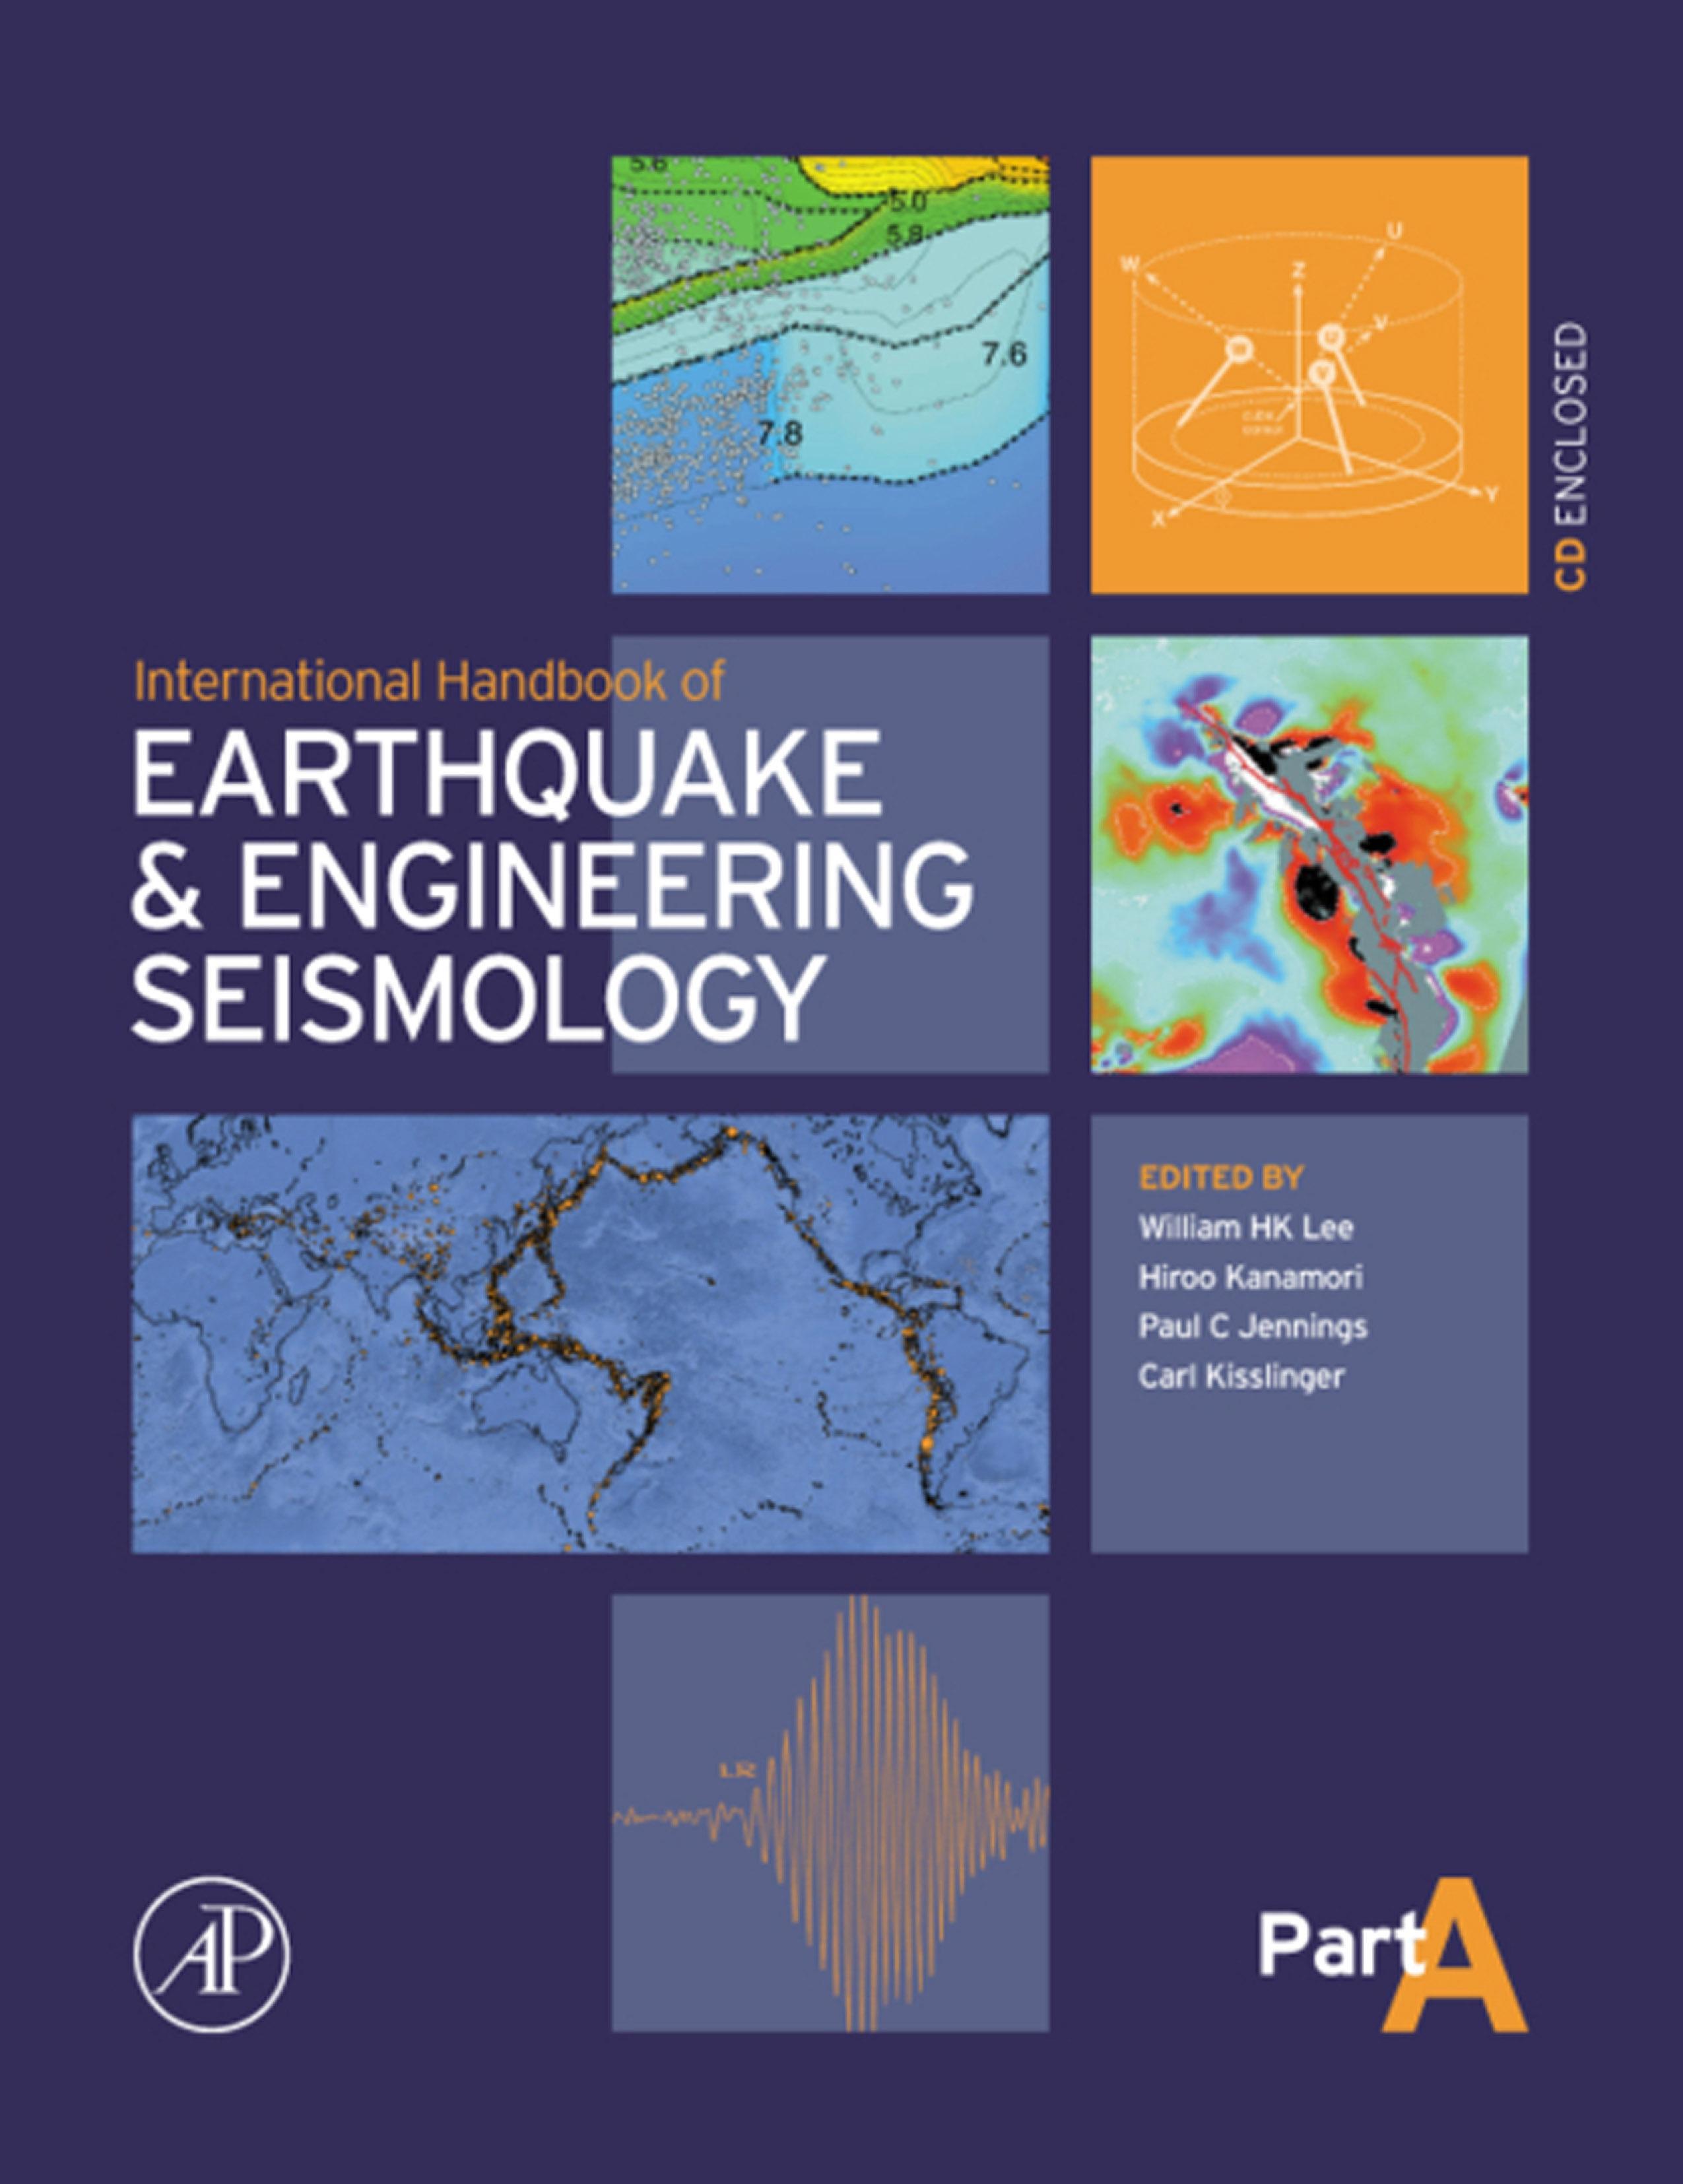 International Handbook of Earthquake & Engineering Seismology, Part A EB9780080489223